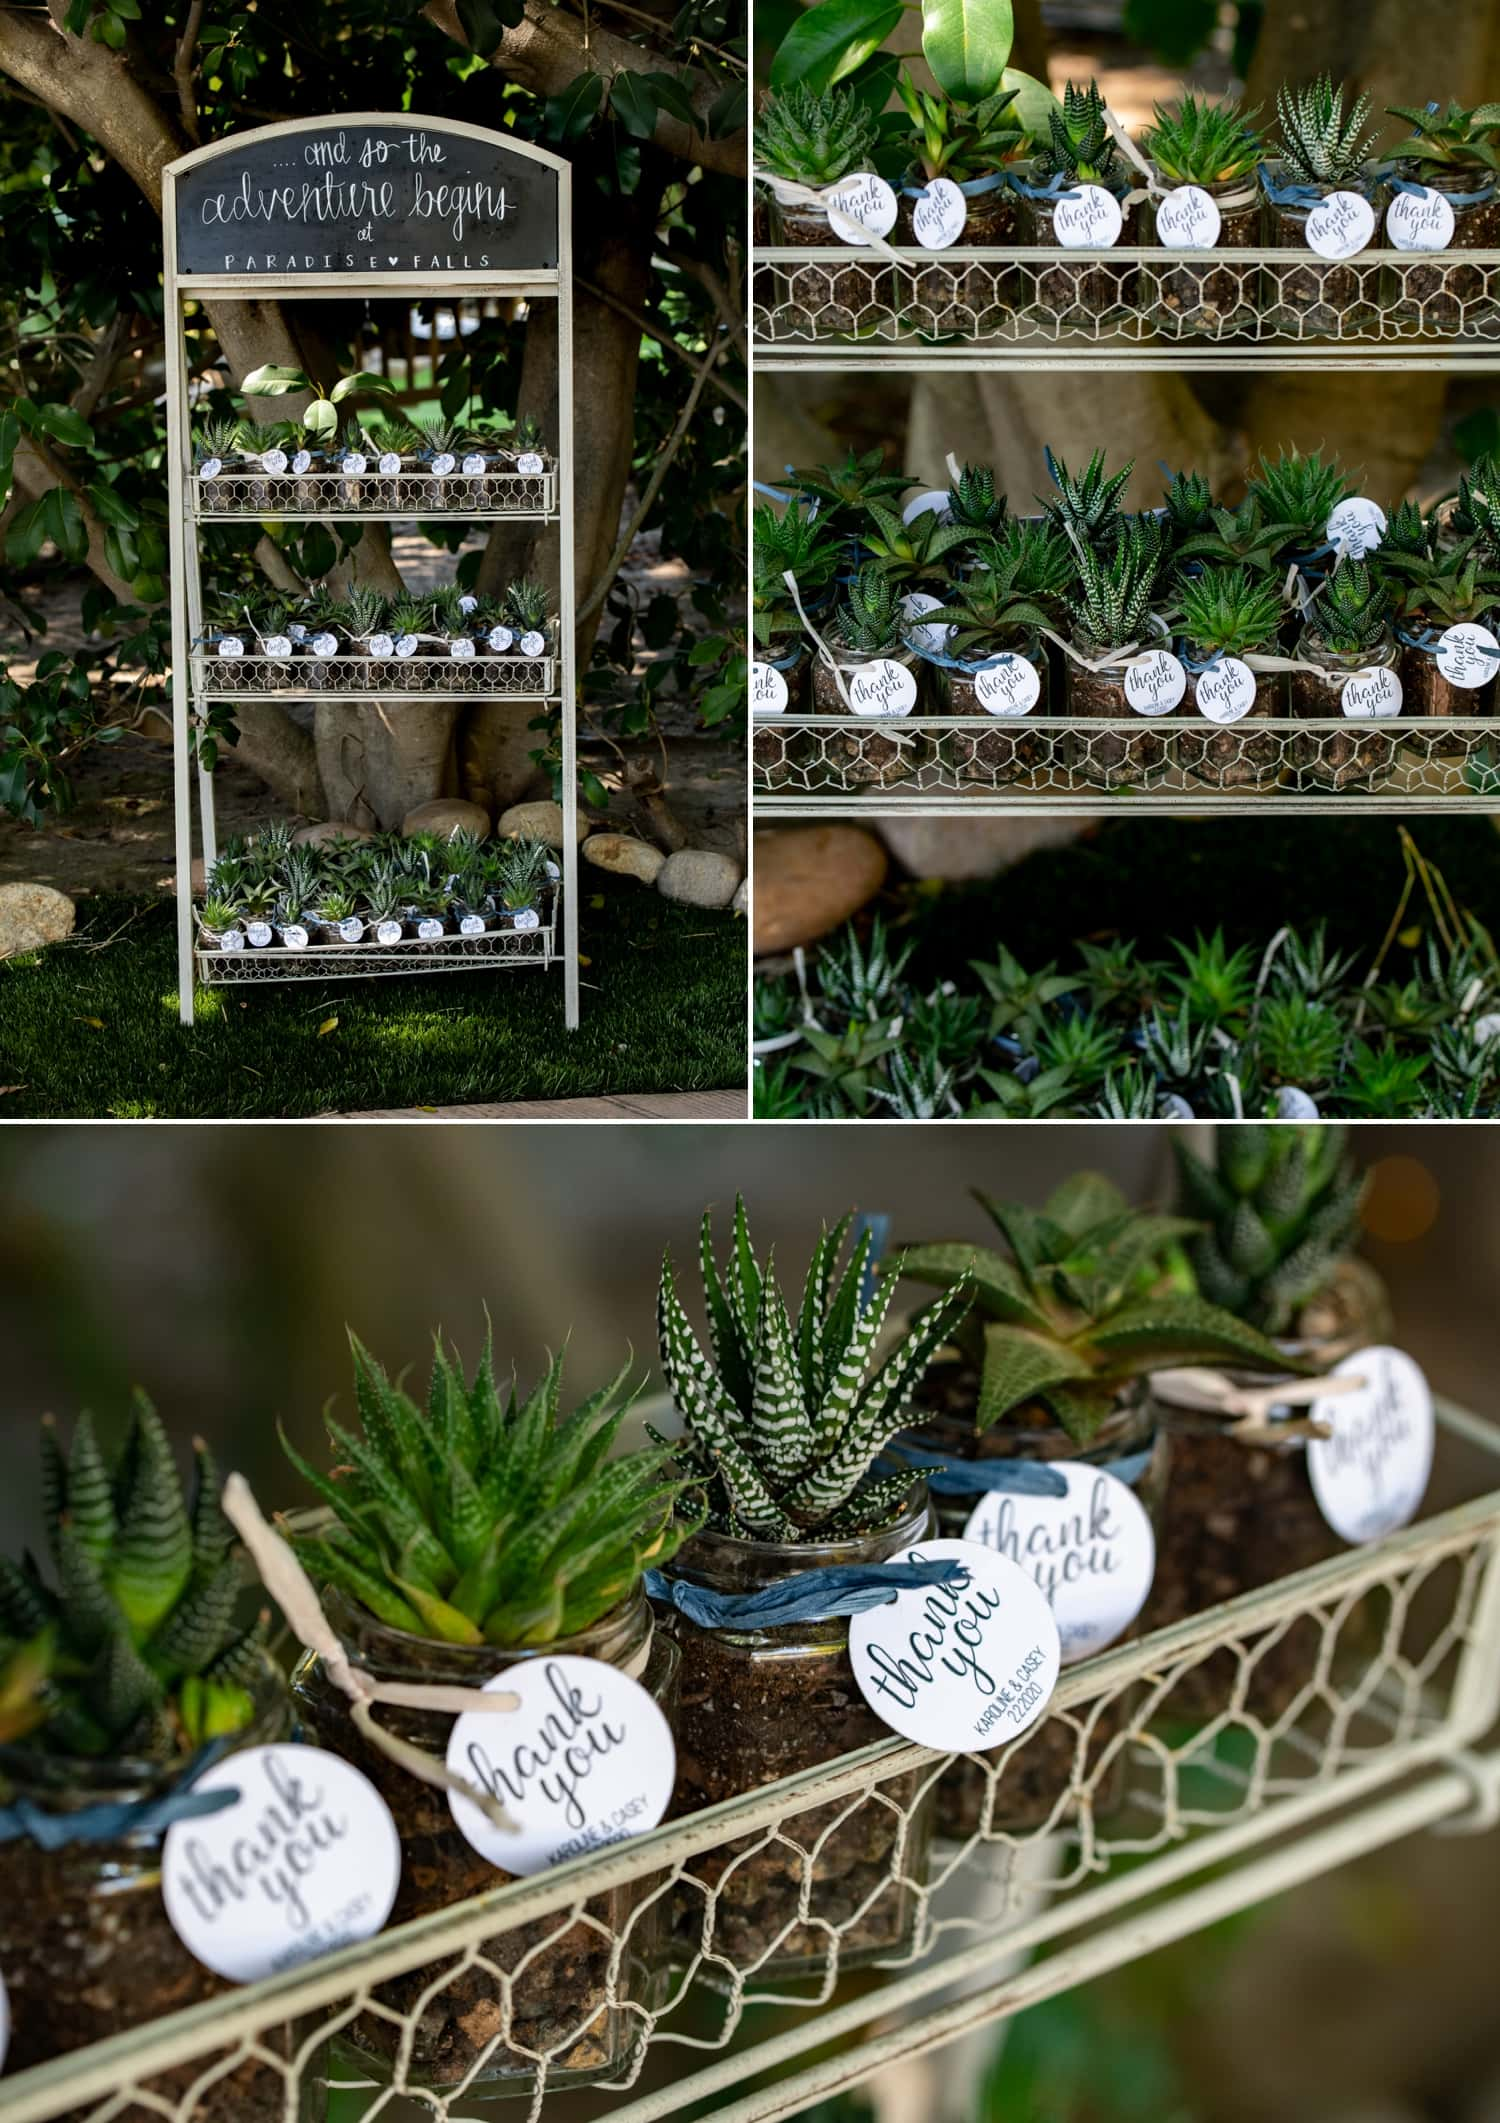 Wedding party favors at Botanica wedding Venue